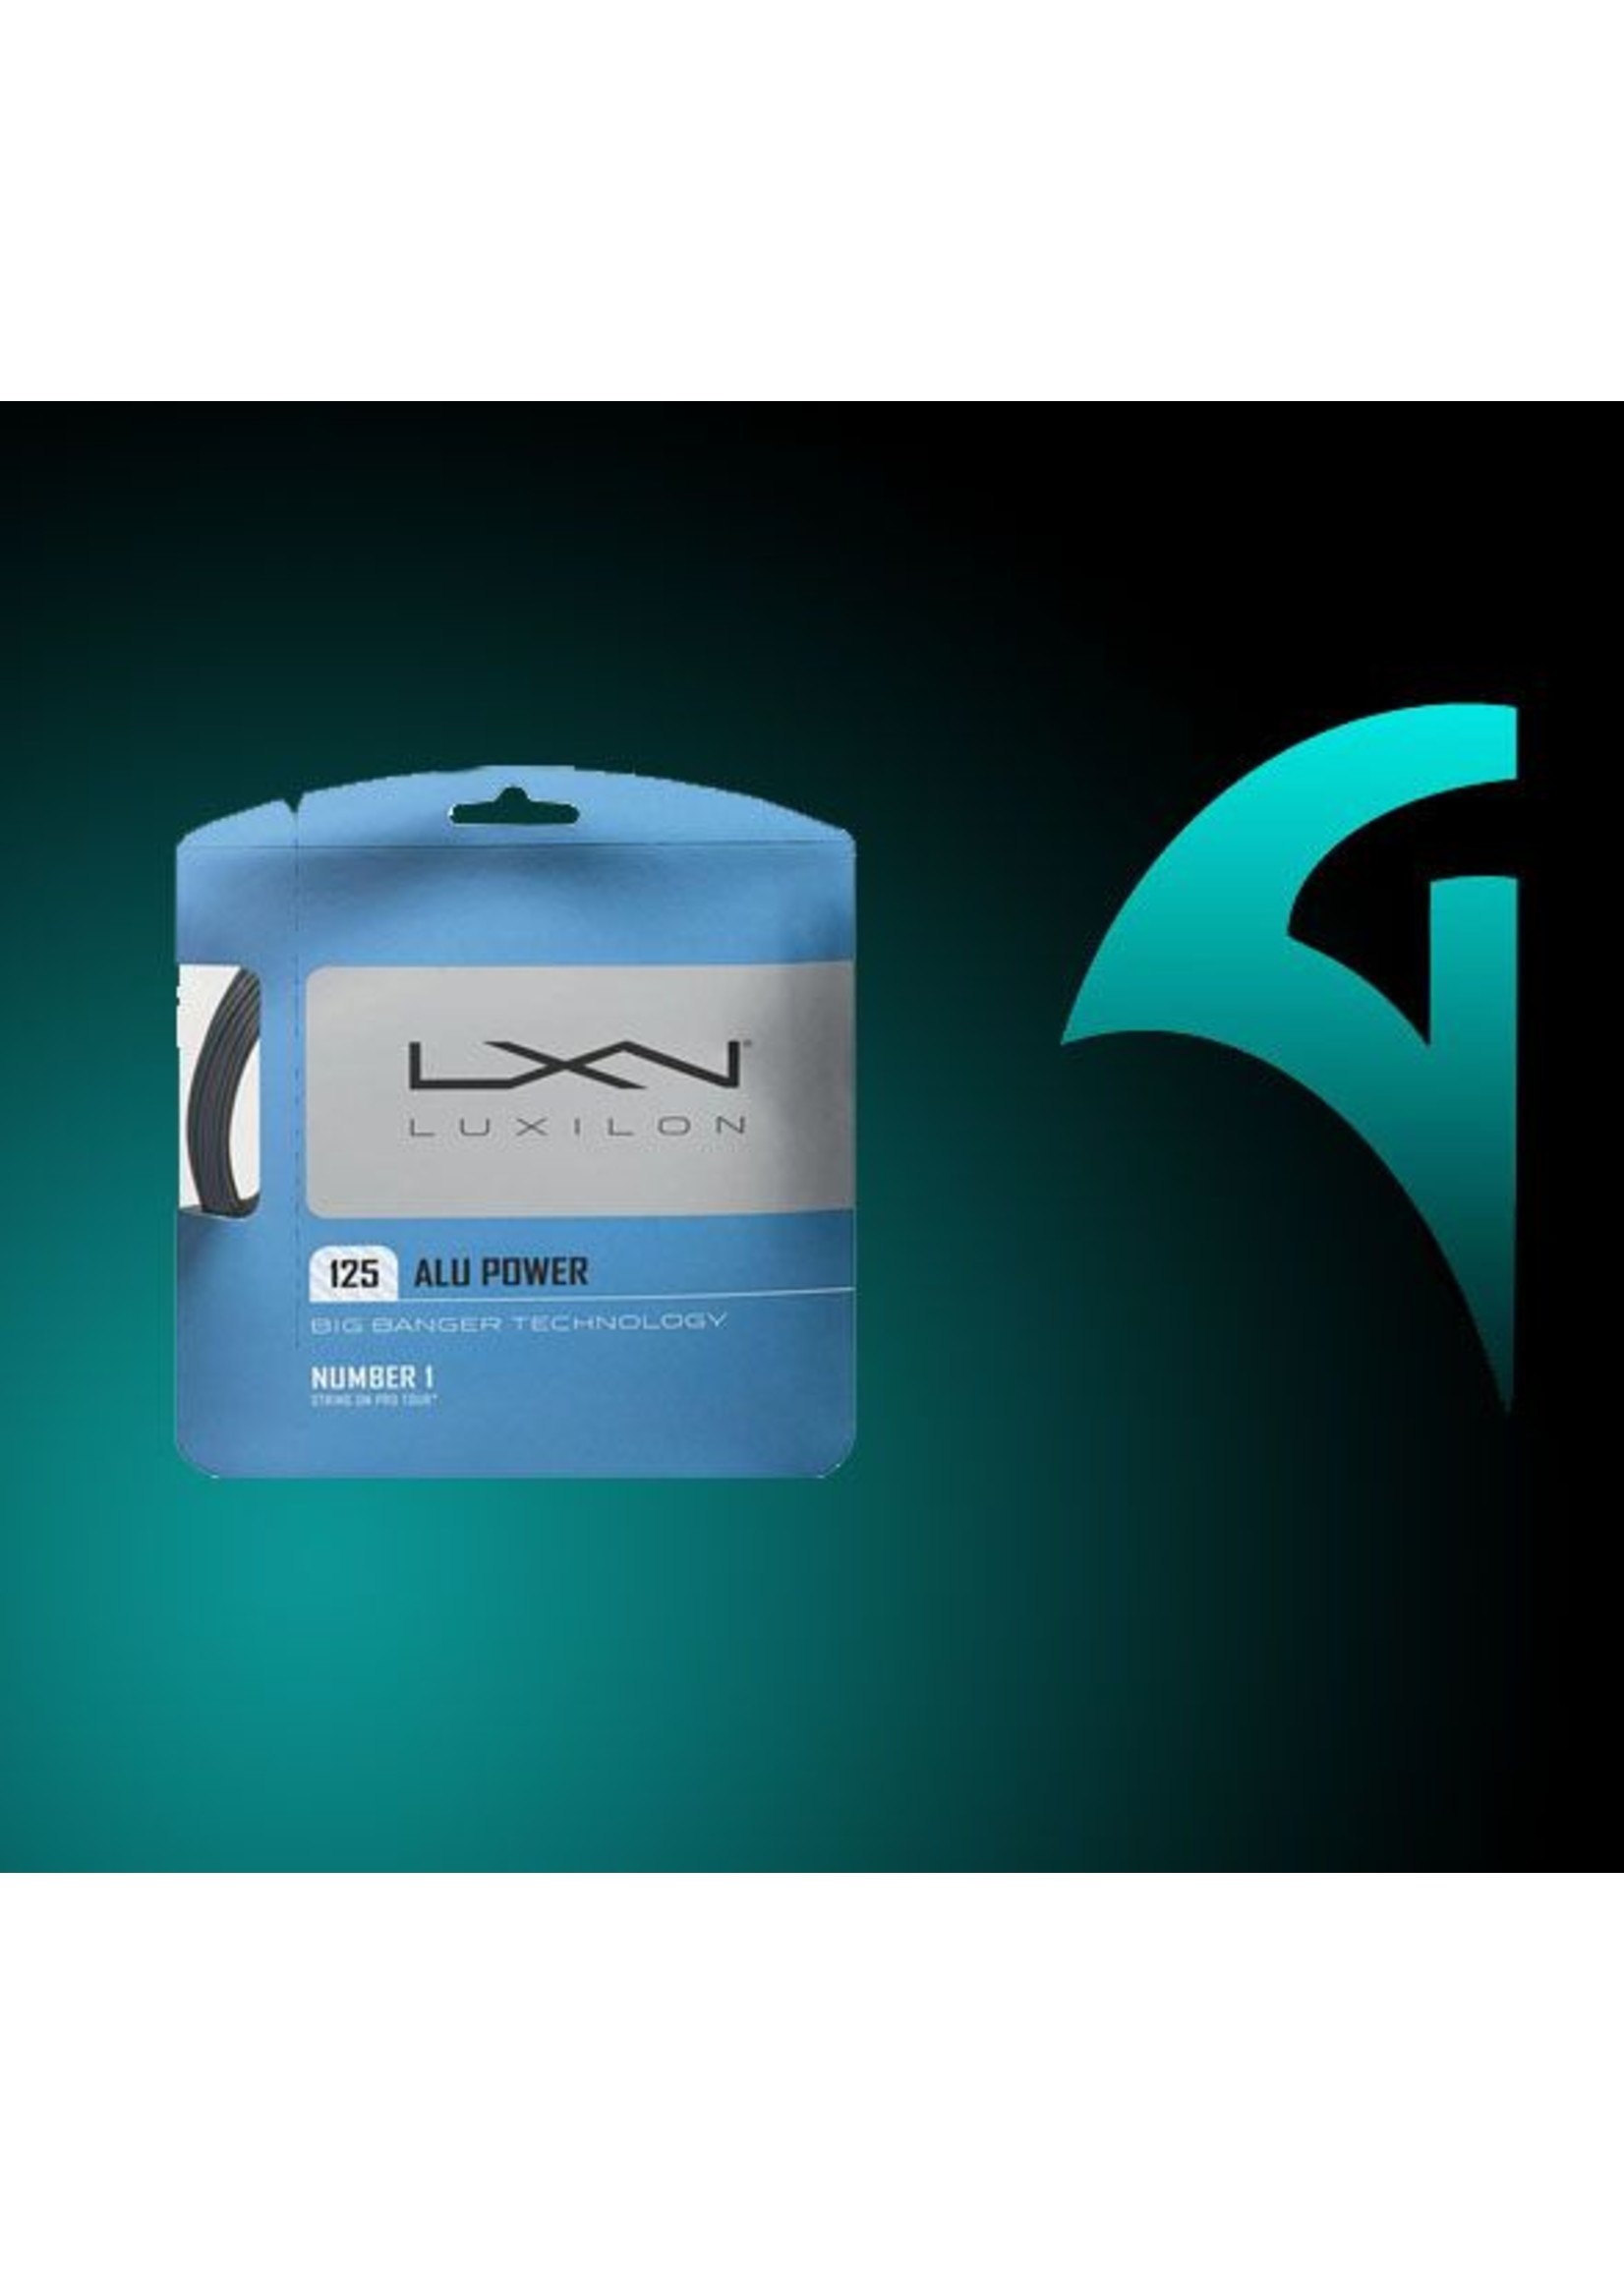 Luxilon Luxilon Alu Power Restring